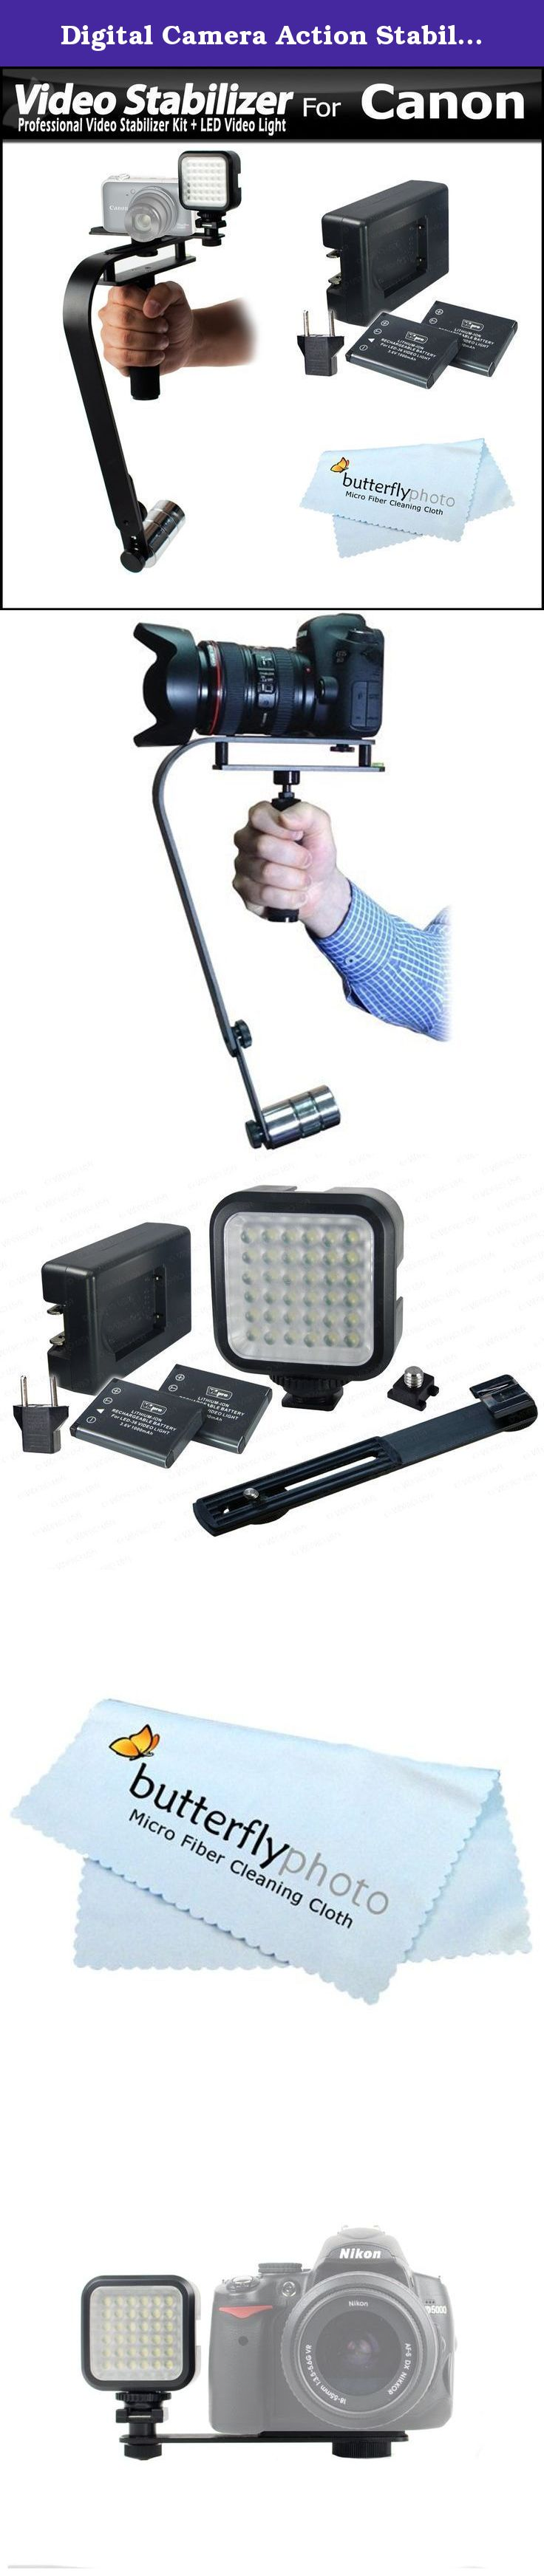 Digital Camera Action Stabilizer Handle Deluxe Led Light Kit For